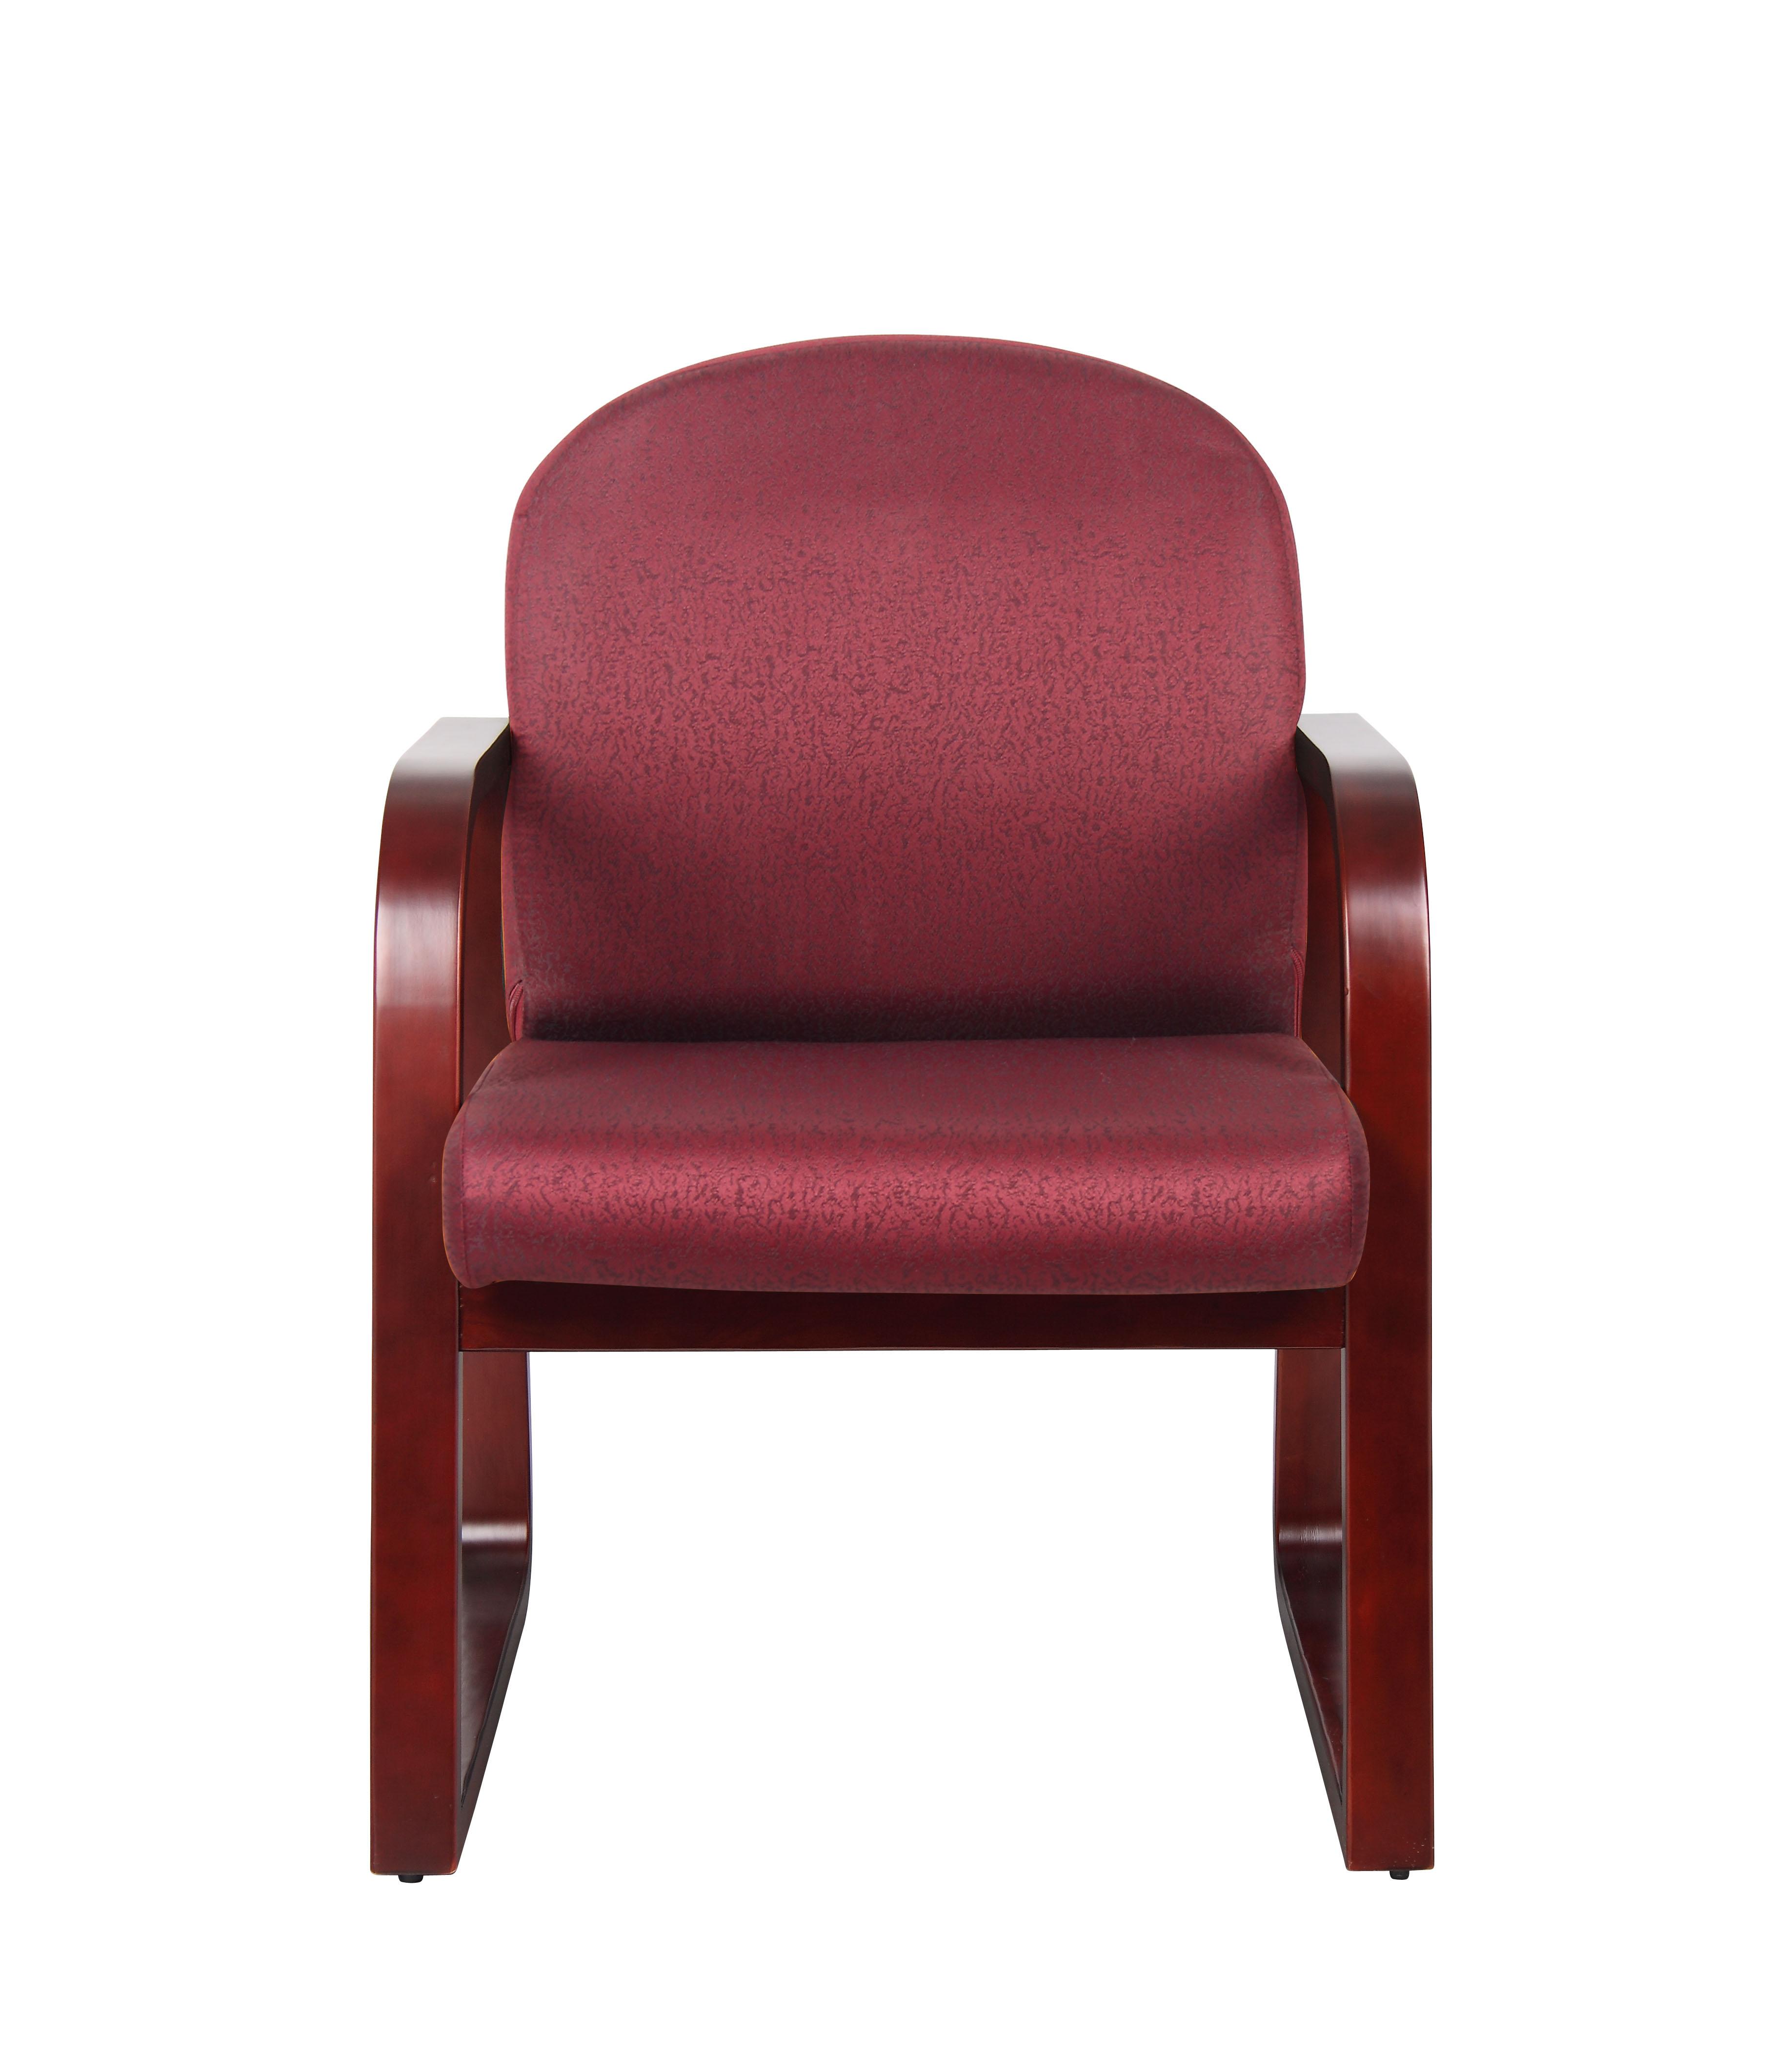 Boss Mahogany Frame Side Chair In Burgundy Fabric – BossChair